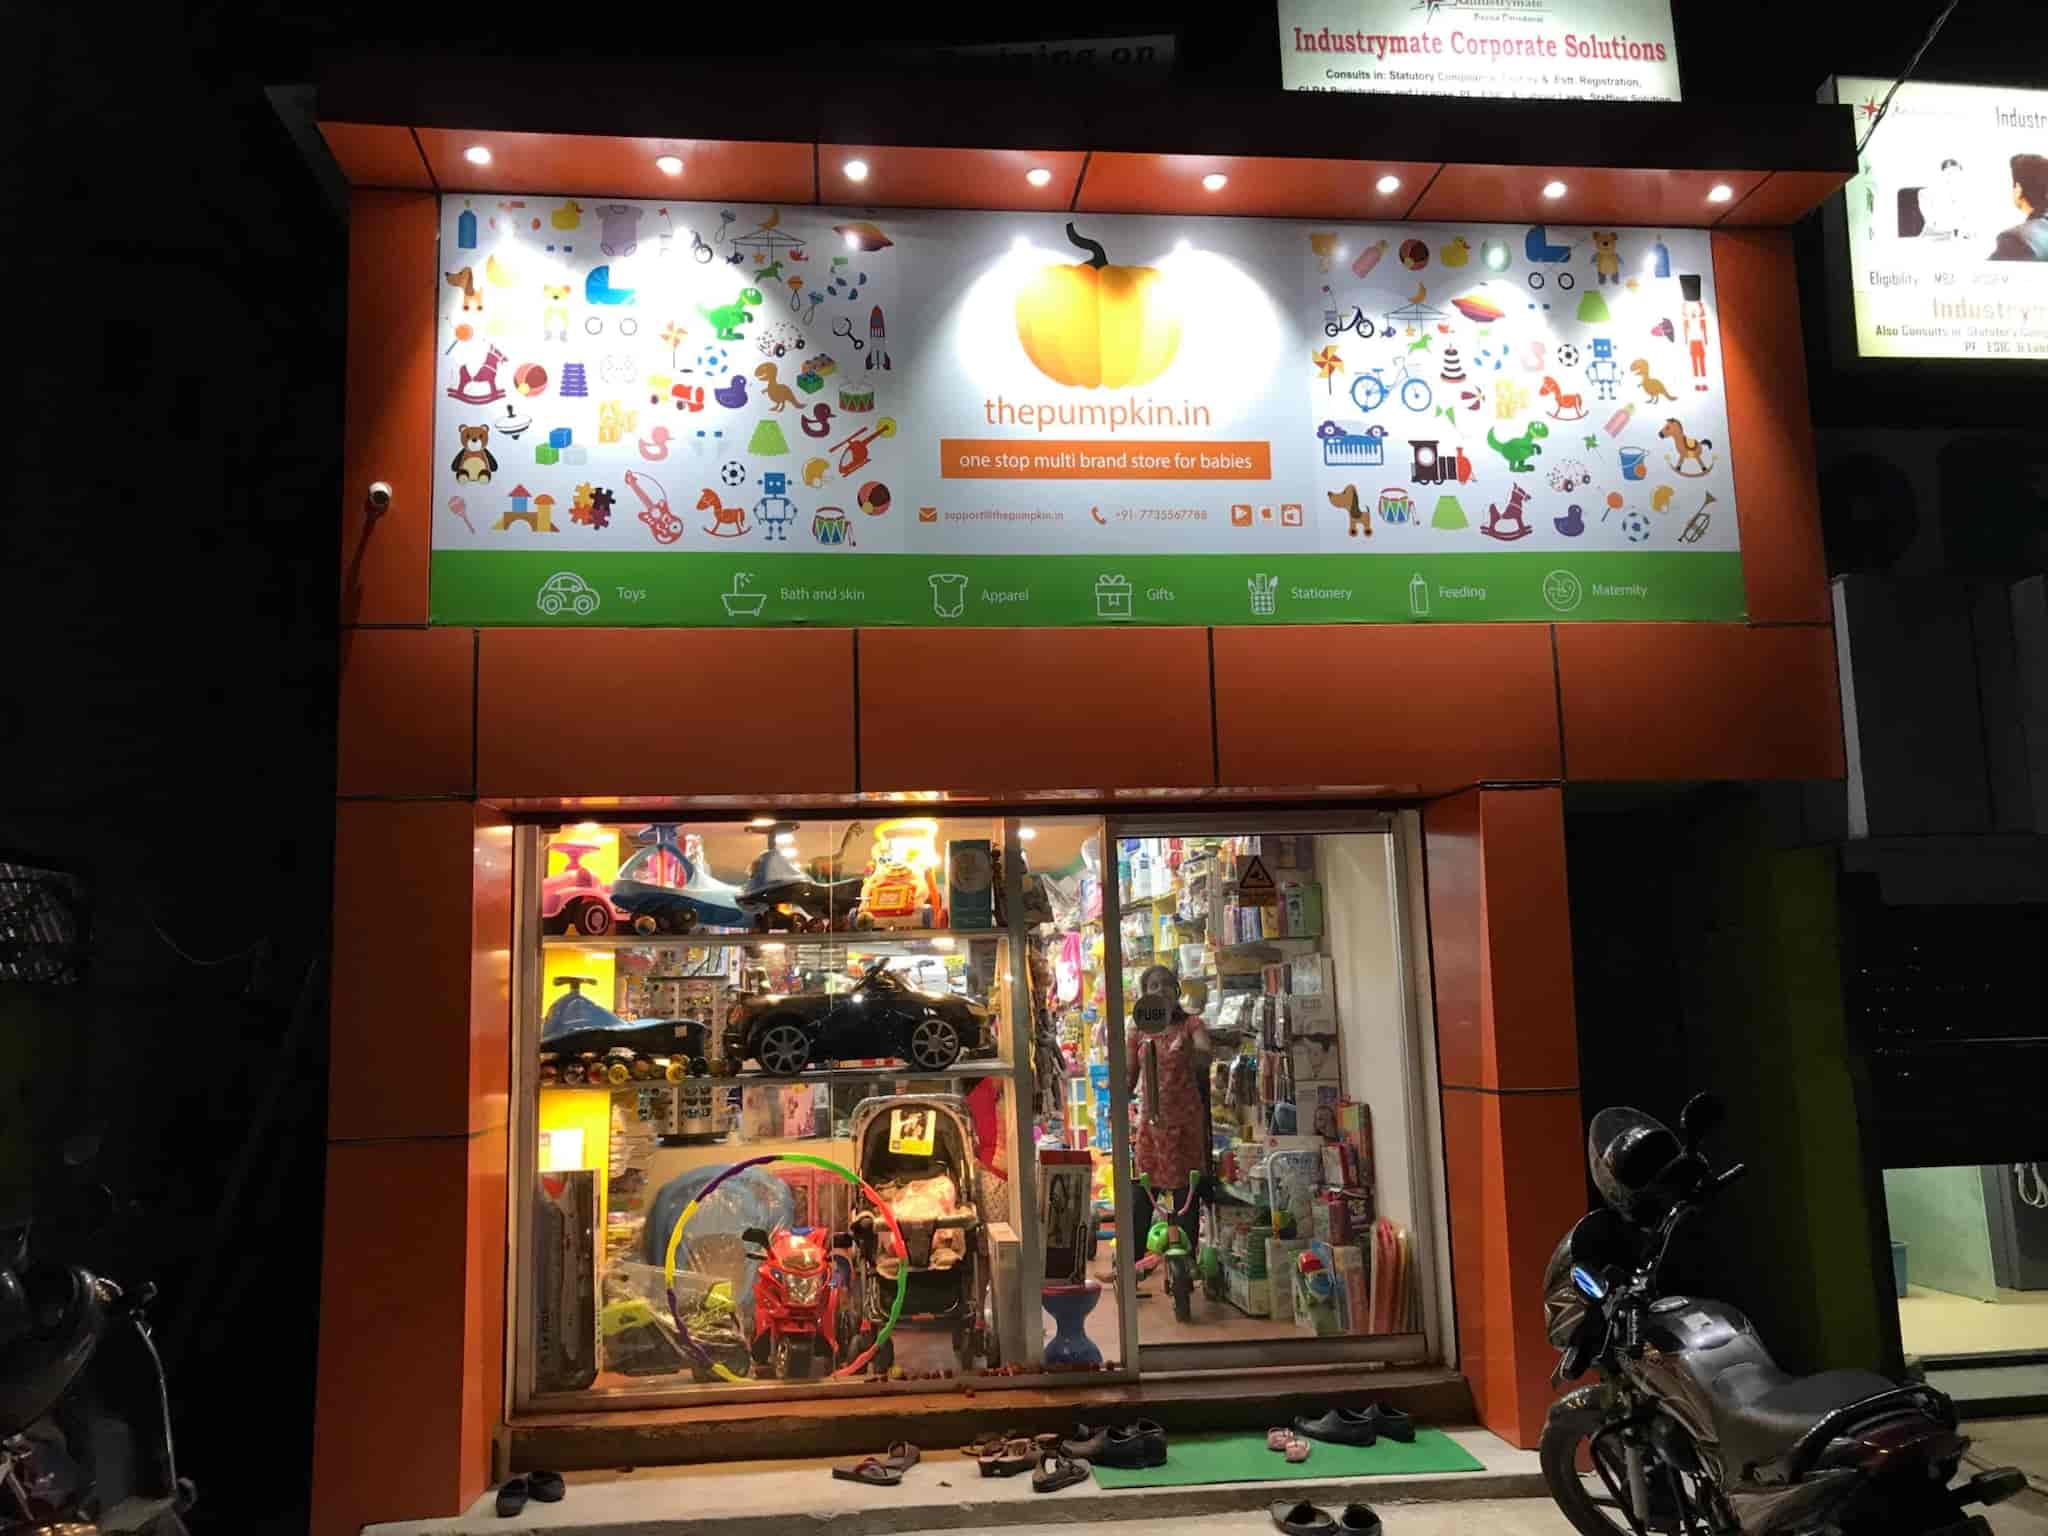 Thepumpkinin Baby Shop Photos, Patia, Bhubaneshwar- Pictures ...